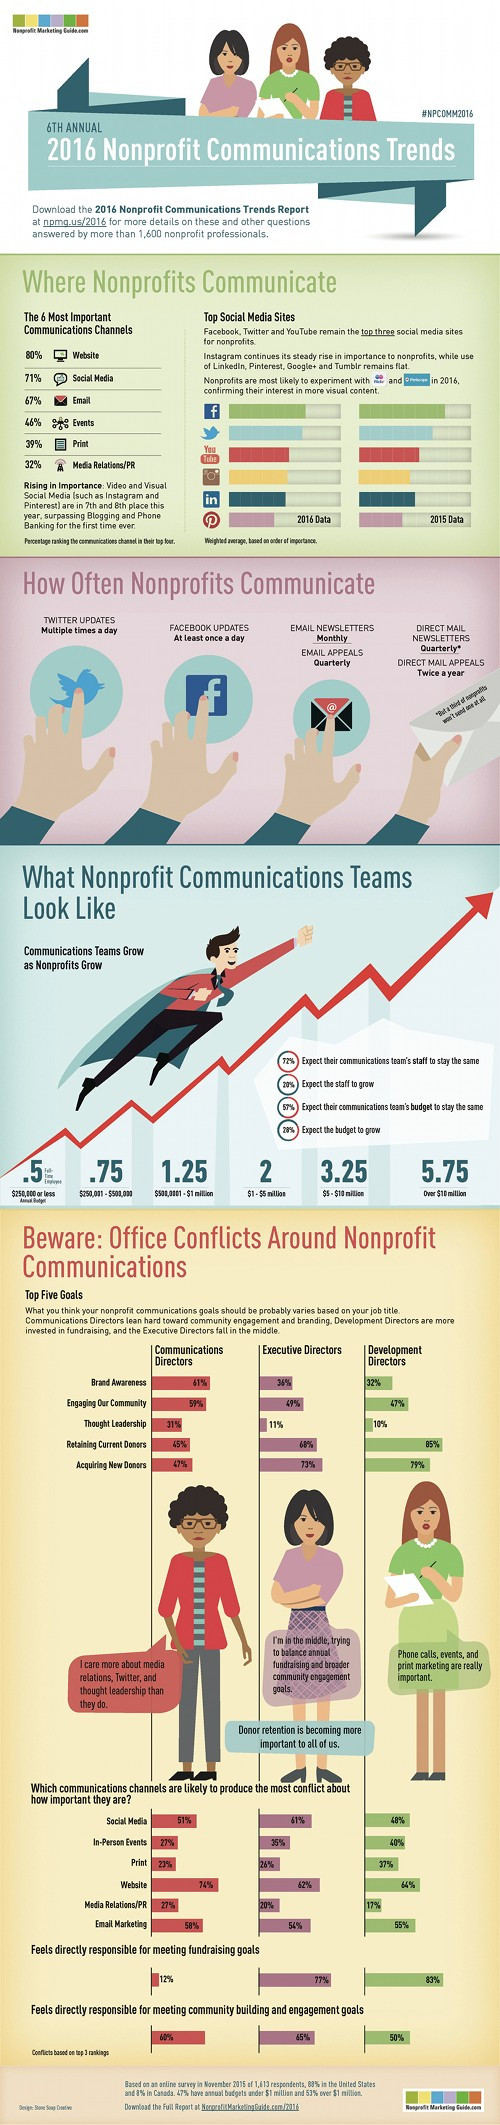 CommunicationsTrends